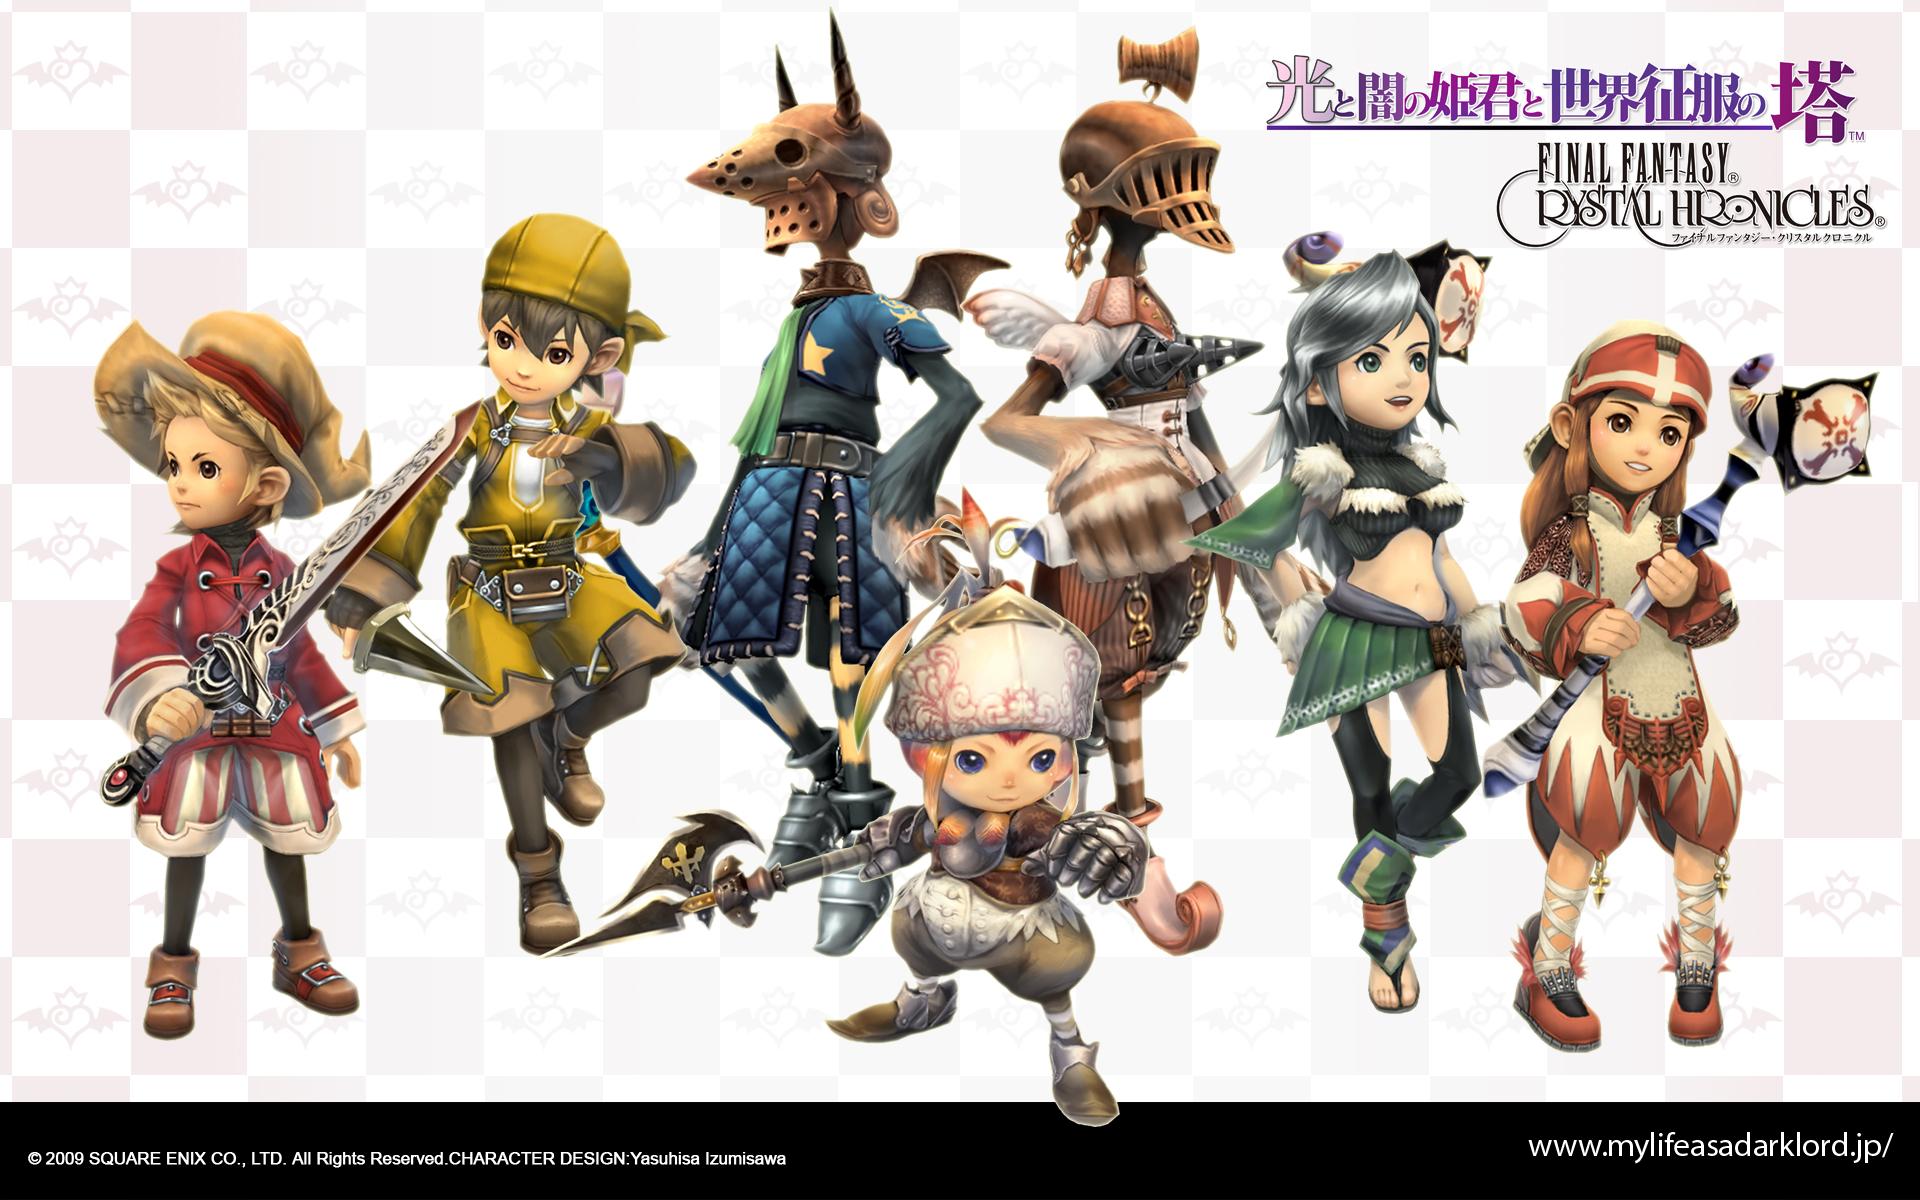 Fuck Yeah Final Fantasy The Final Fantasy Crystal Chronicles Fan